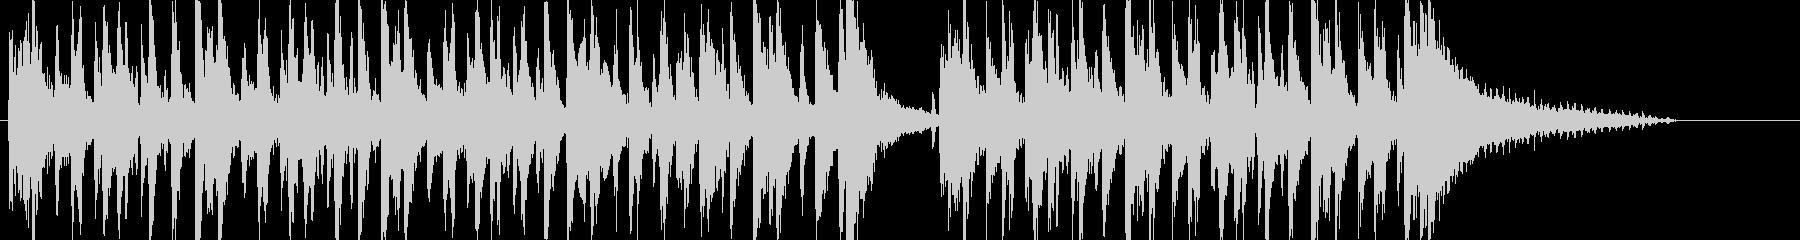 【CM】ダークでお洒落なイメージの未再生の波形